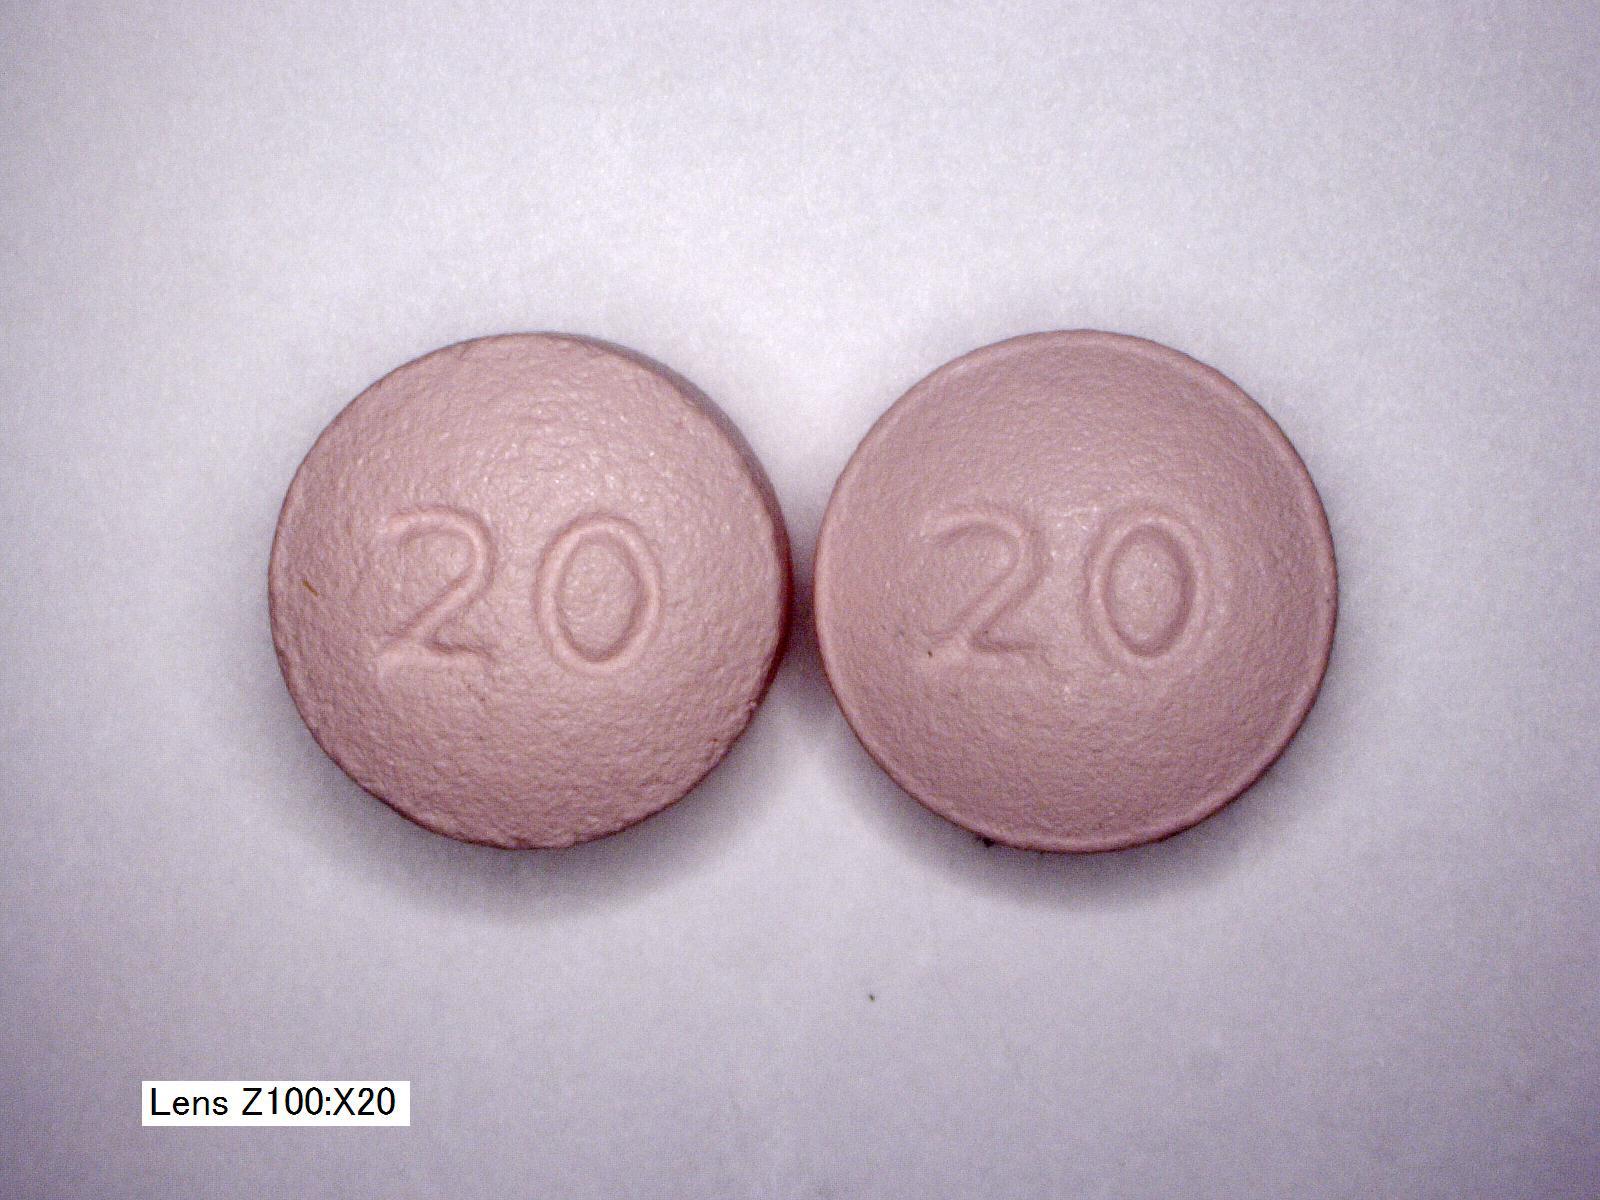 oxycodone retardtabletten